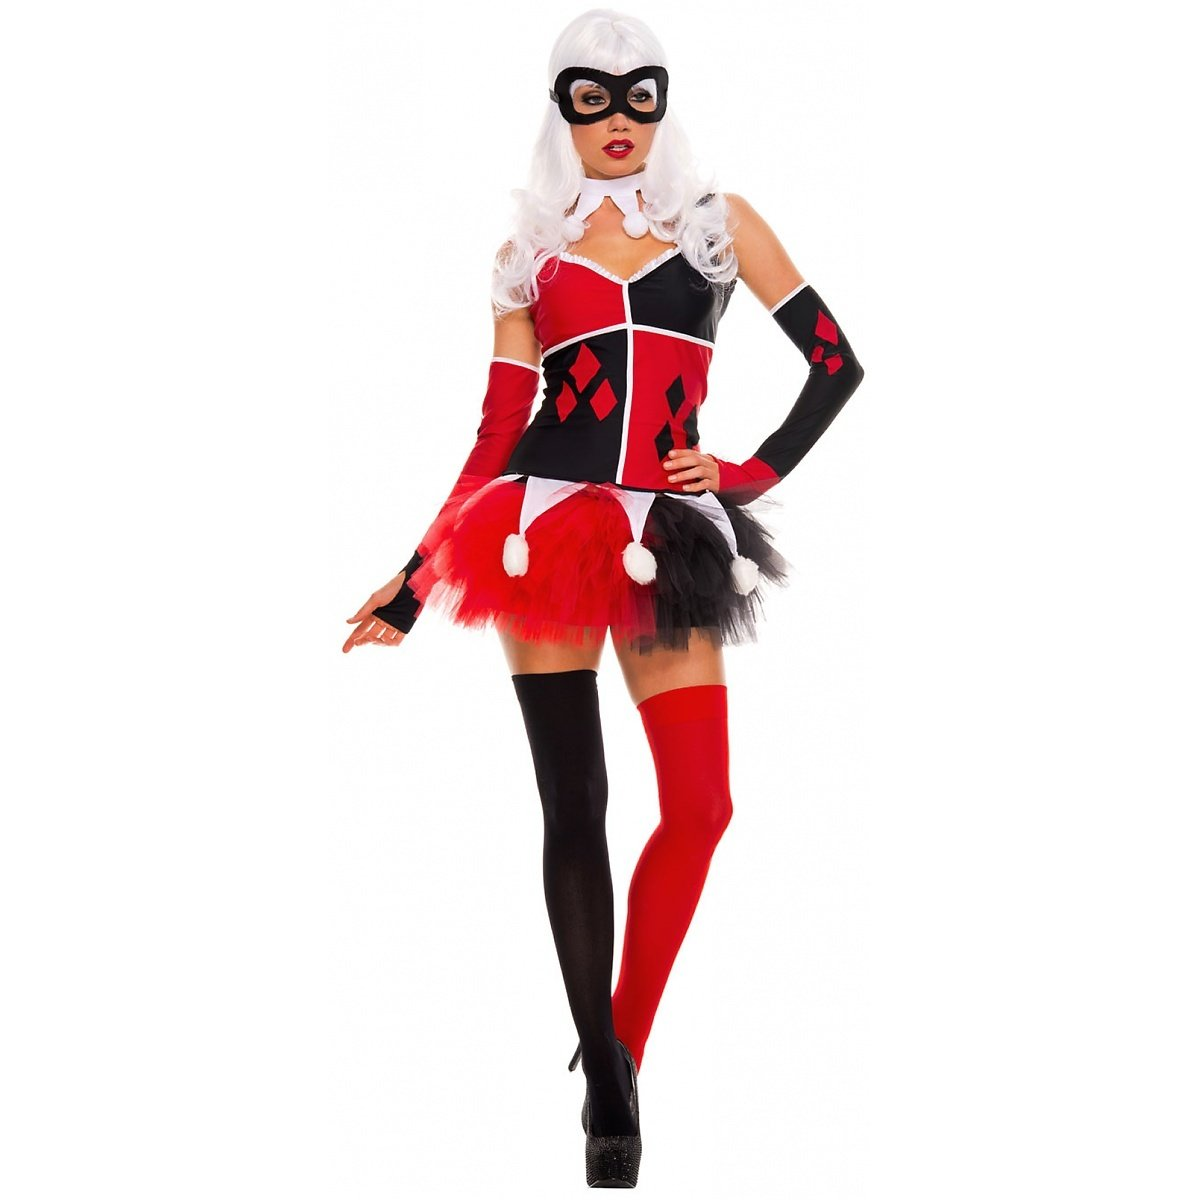 4428a1d0ecf Amazon.com  Music Legs Women s Harley Jester Costume  Clothing